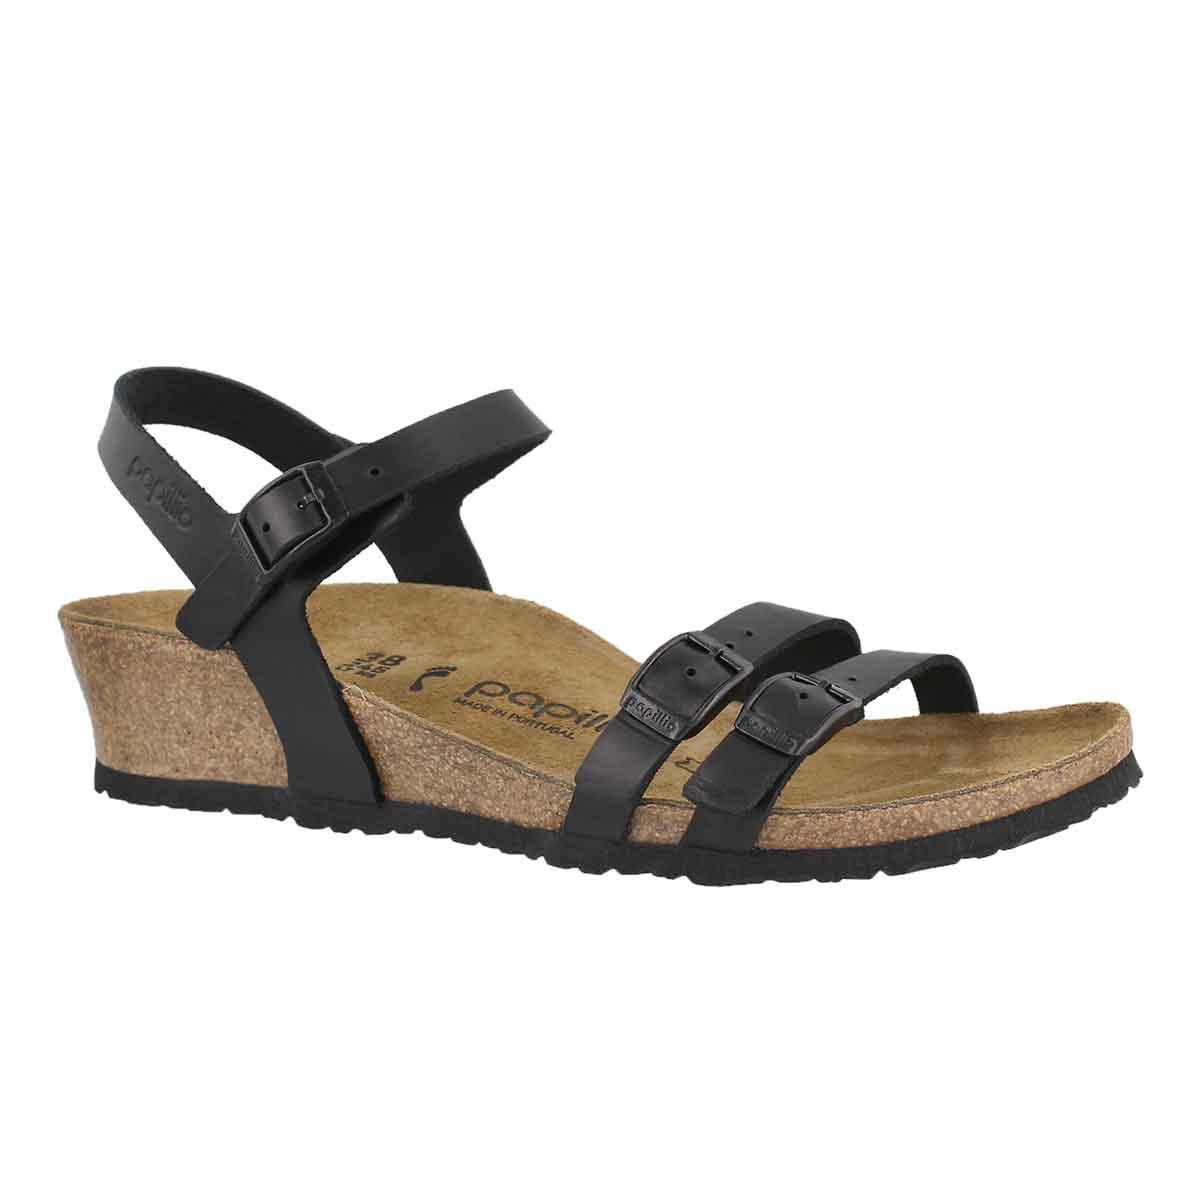 Women's LANA LTR black wedge sandals - Narrow